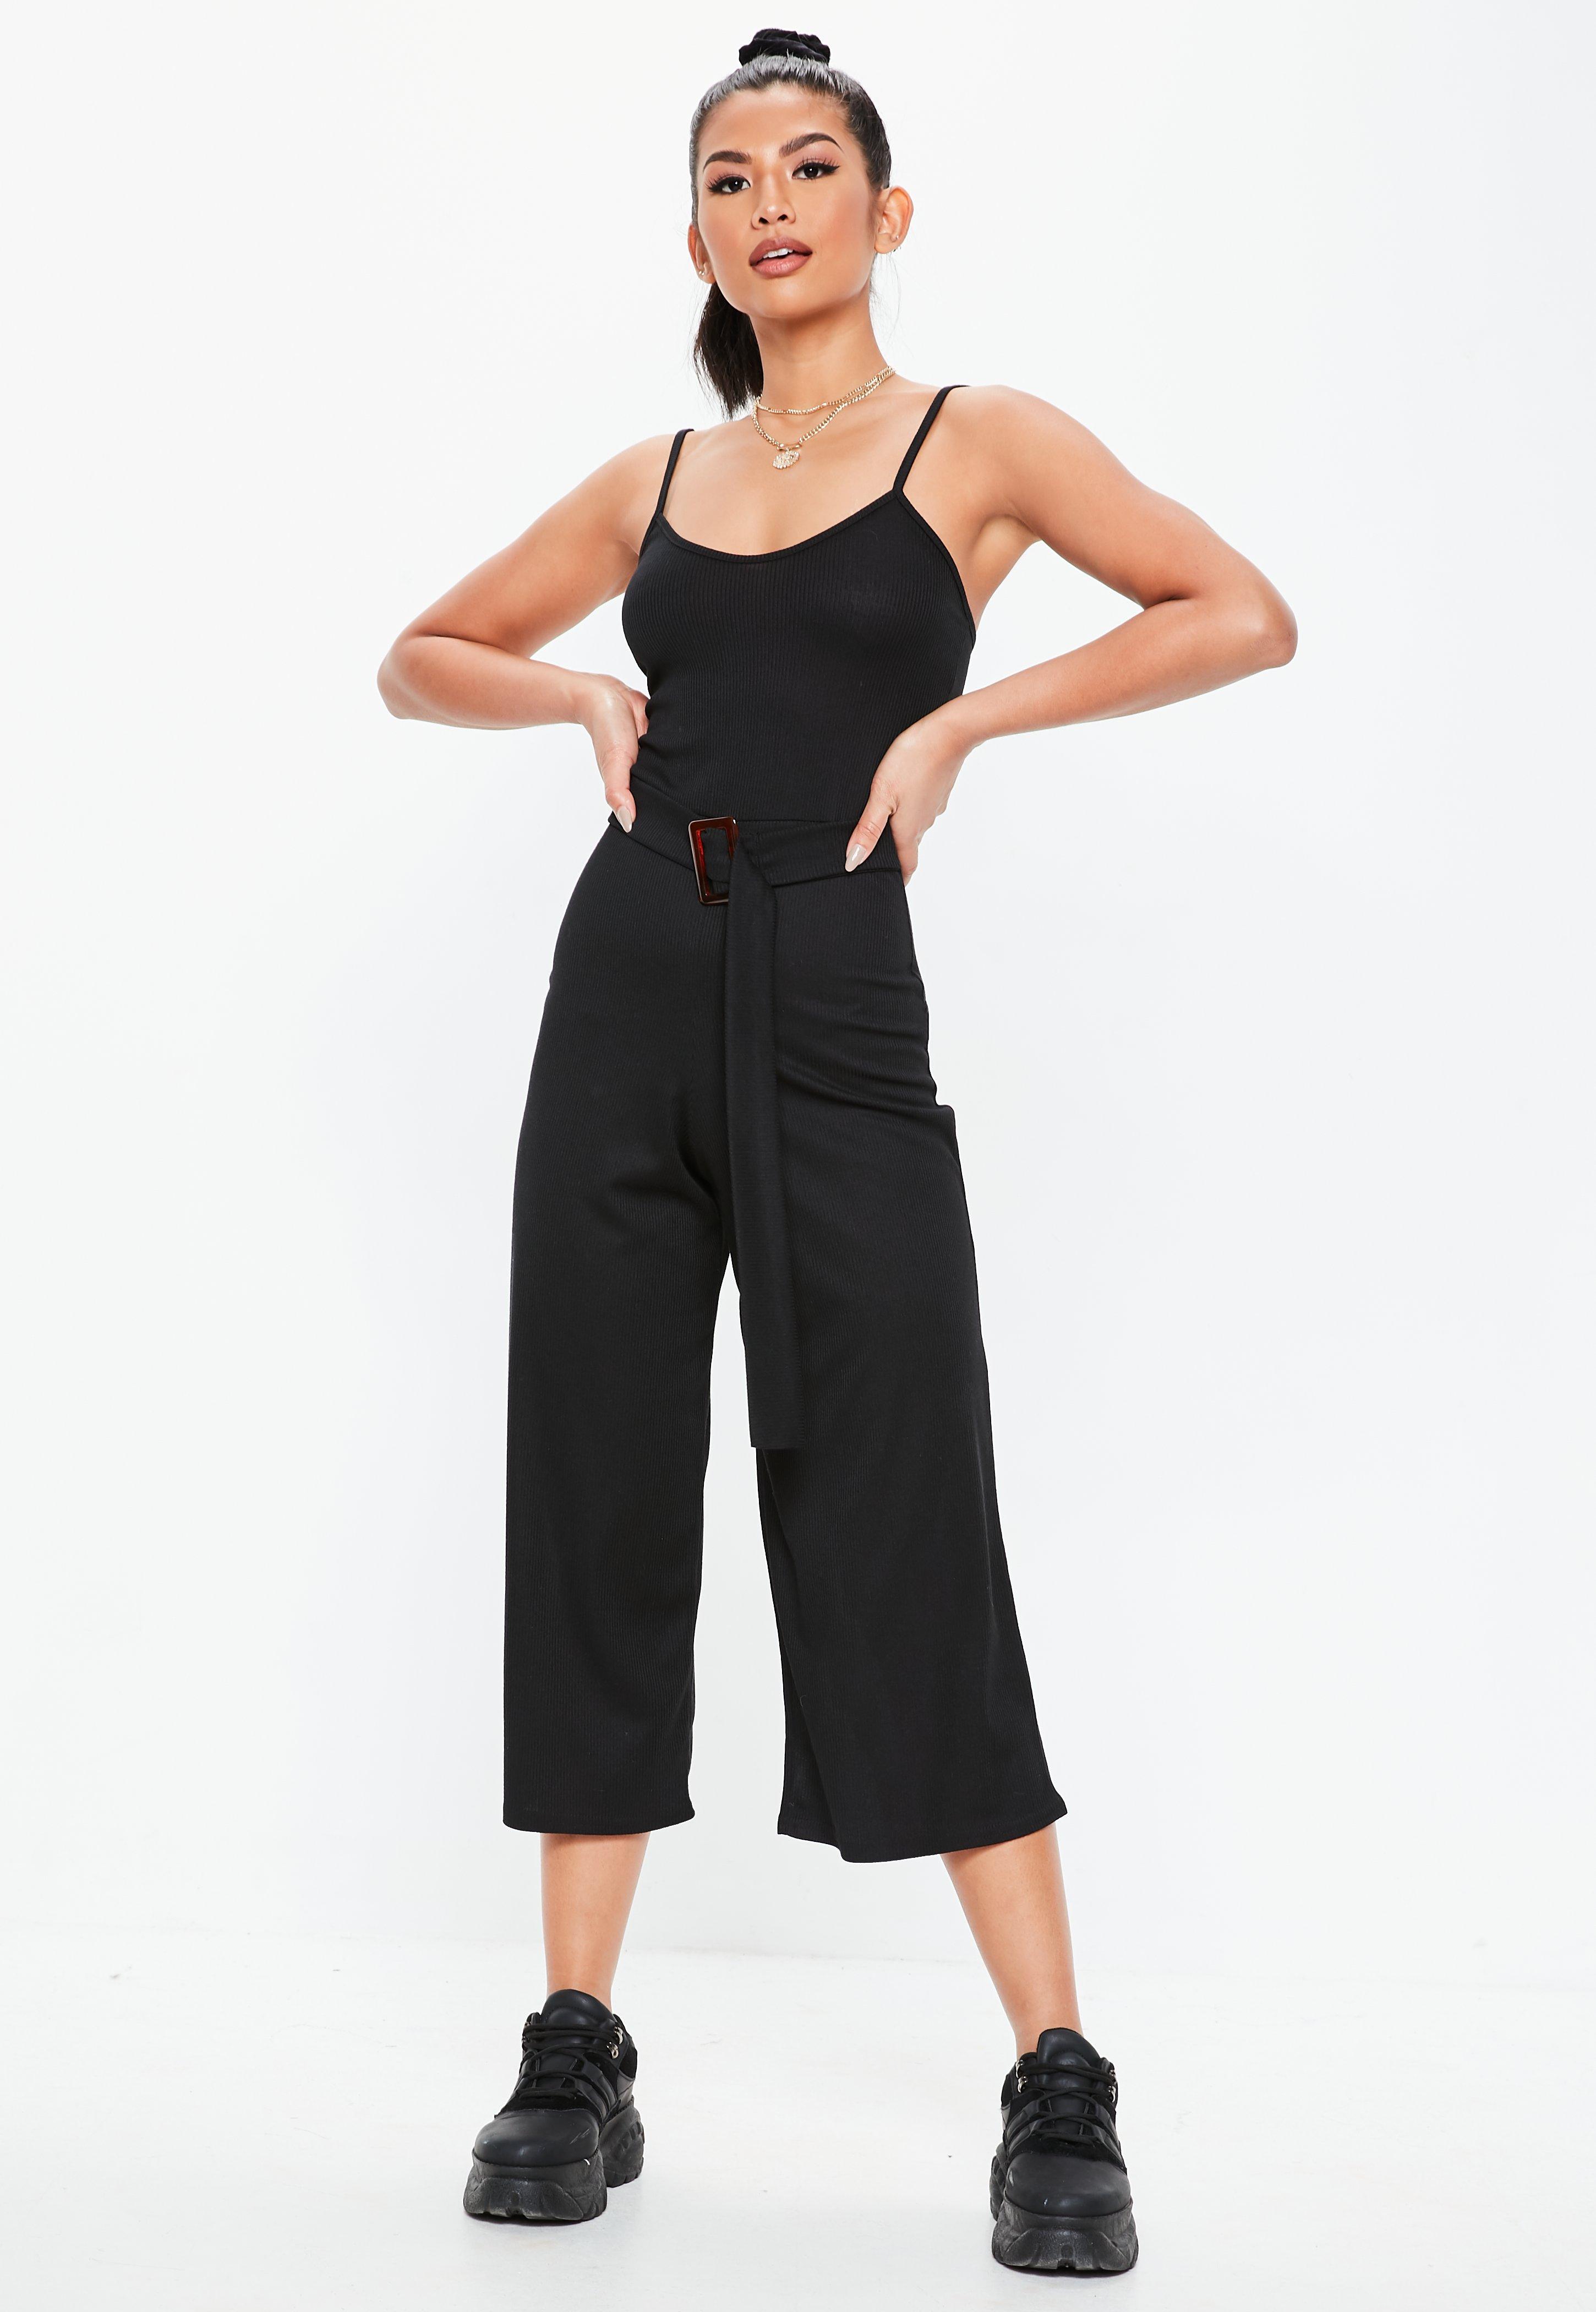 181164f4dcb Culotte Jumpsuits